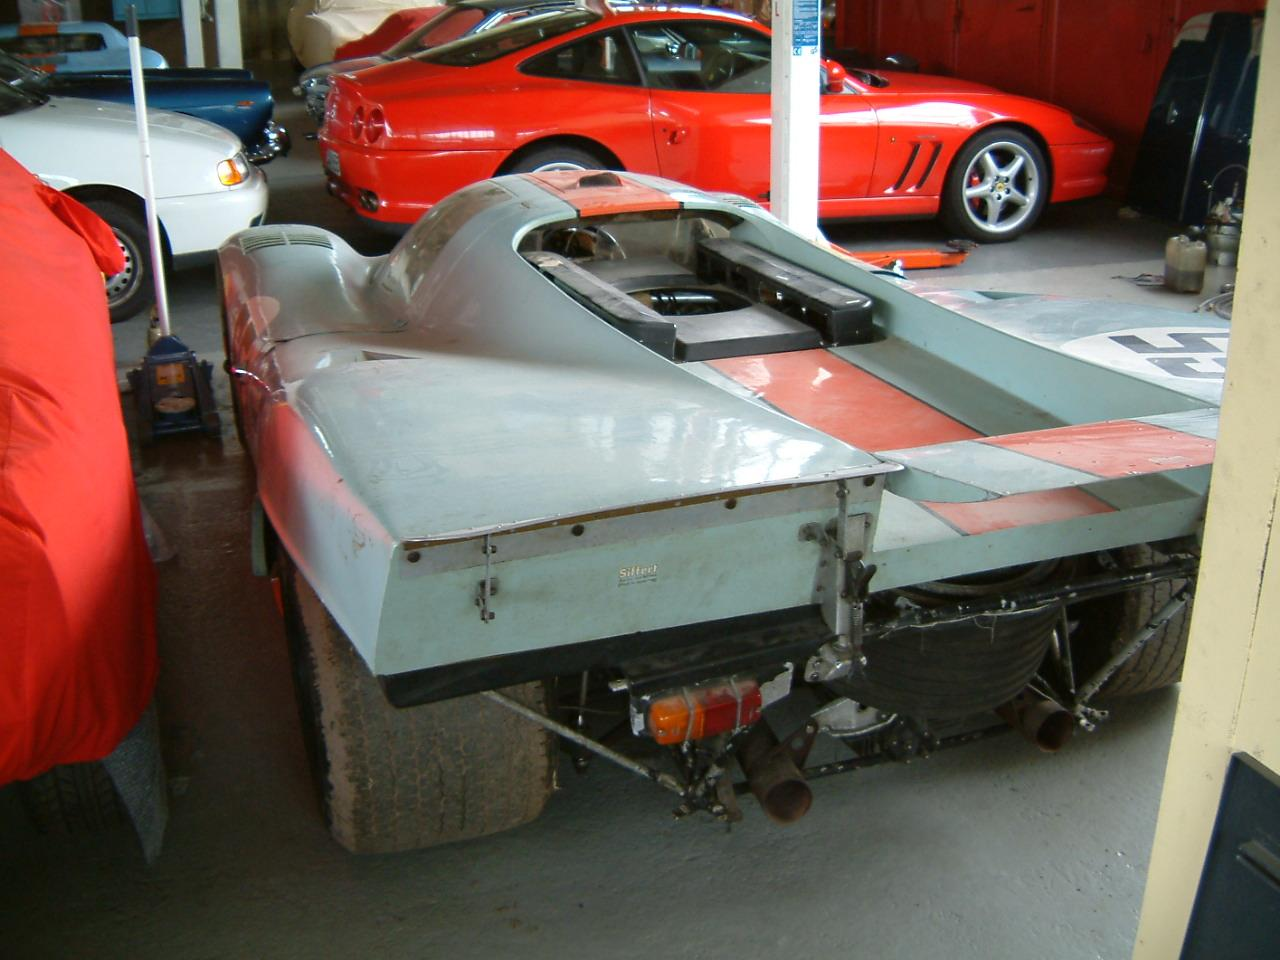 porsche 917 miscelaneas un 917 en un granero. Black Bedroom Furniture Sets. Home Design Ideas